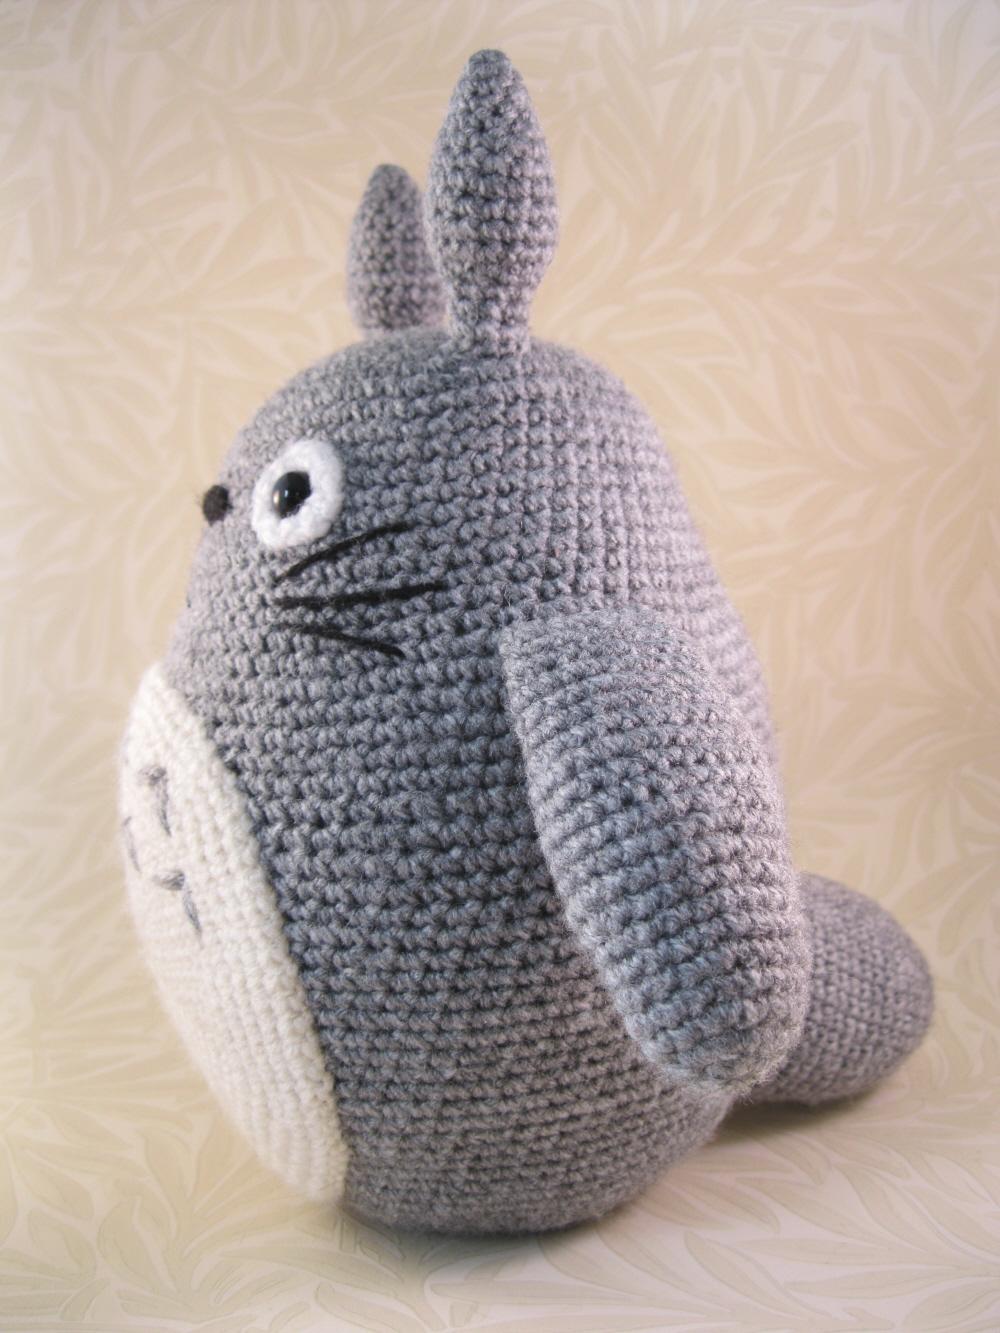 LucyRavenscar - Crochet Creatures: All the Totoros!